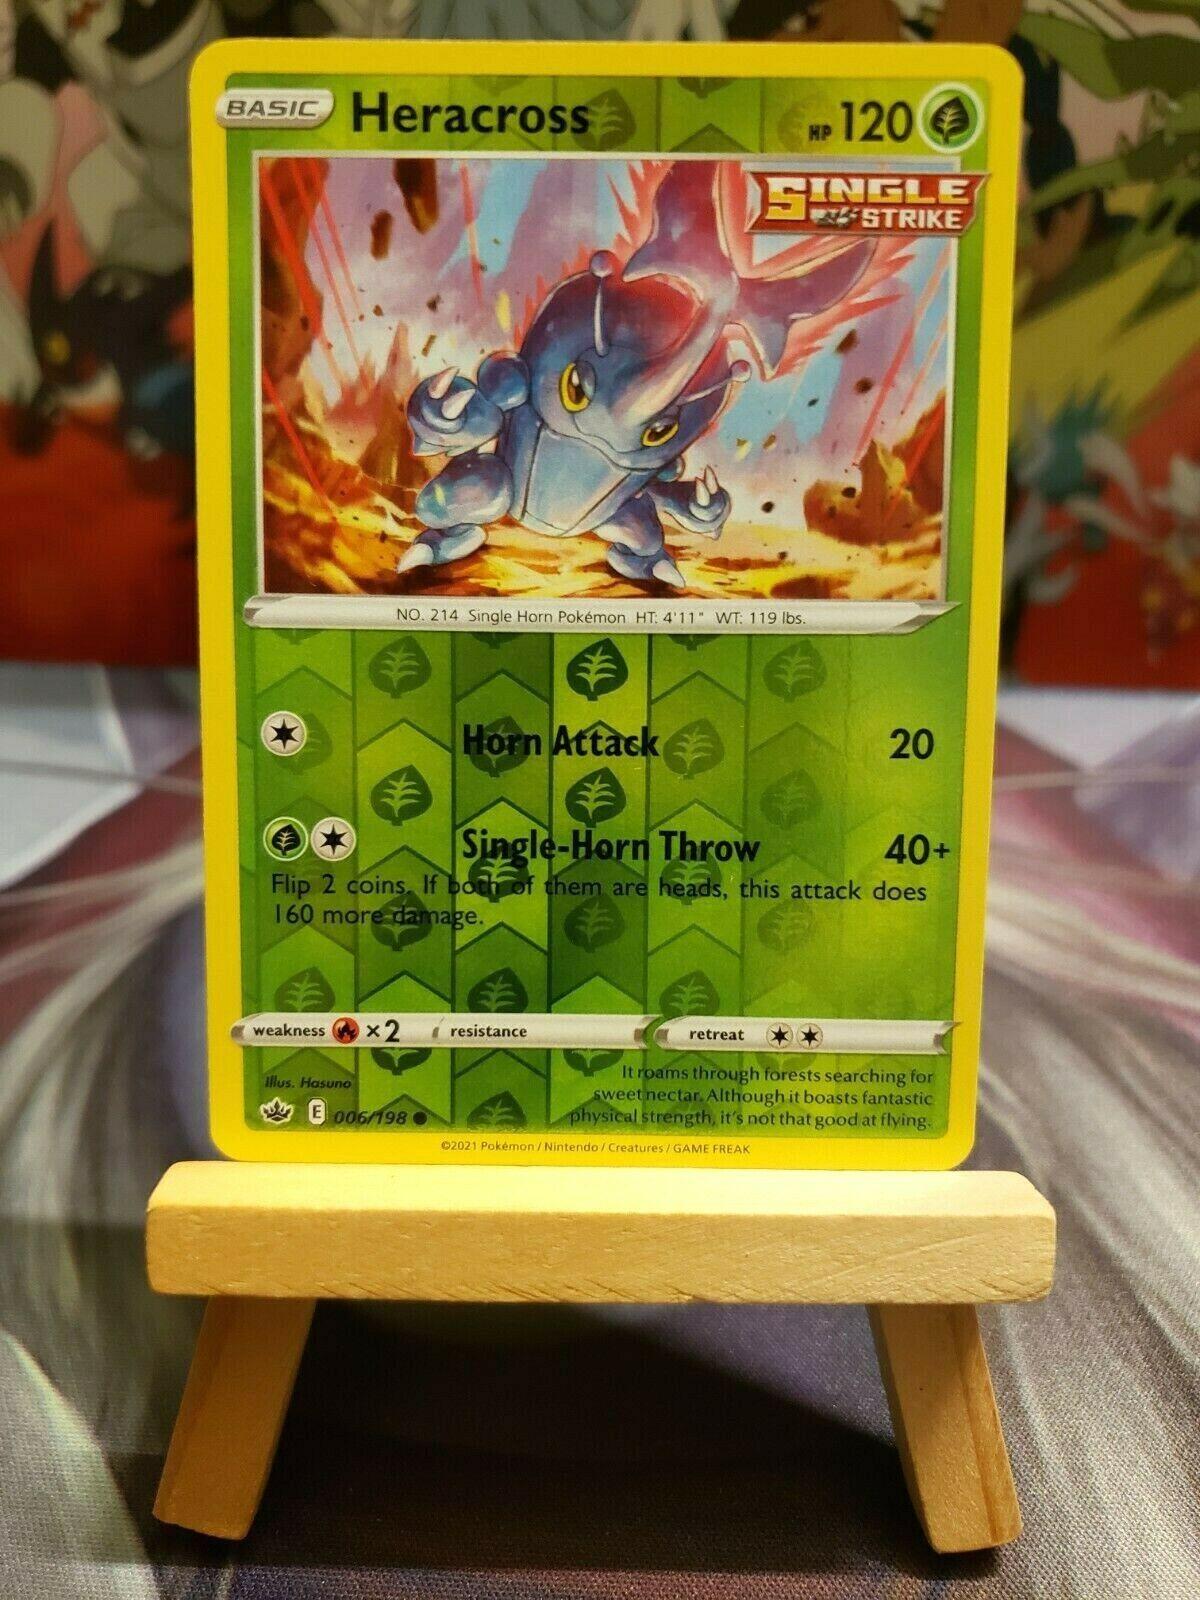 Heracross [006/198] Reverse Holo, SWSH Chilling Reign, Mint/NM, Pokemon TCG